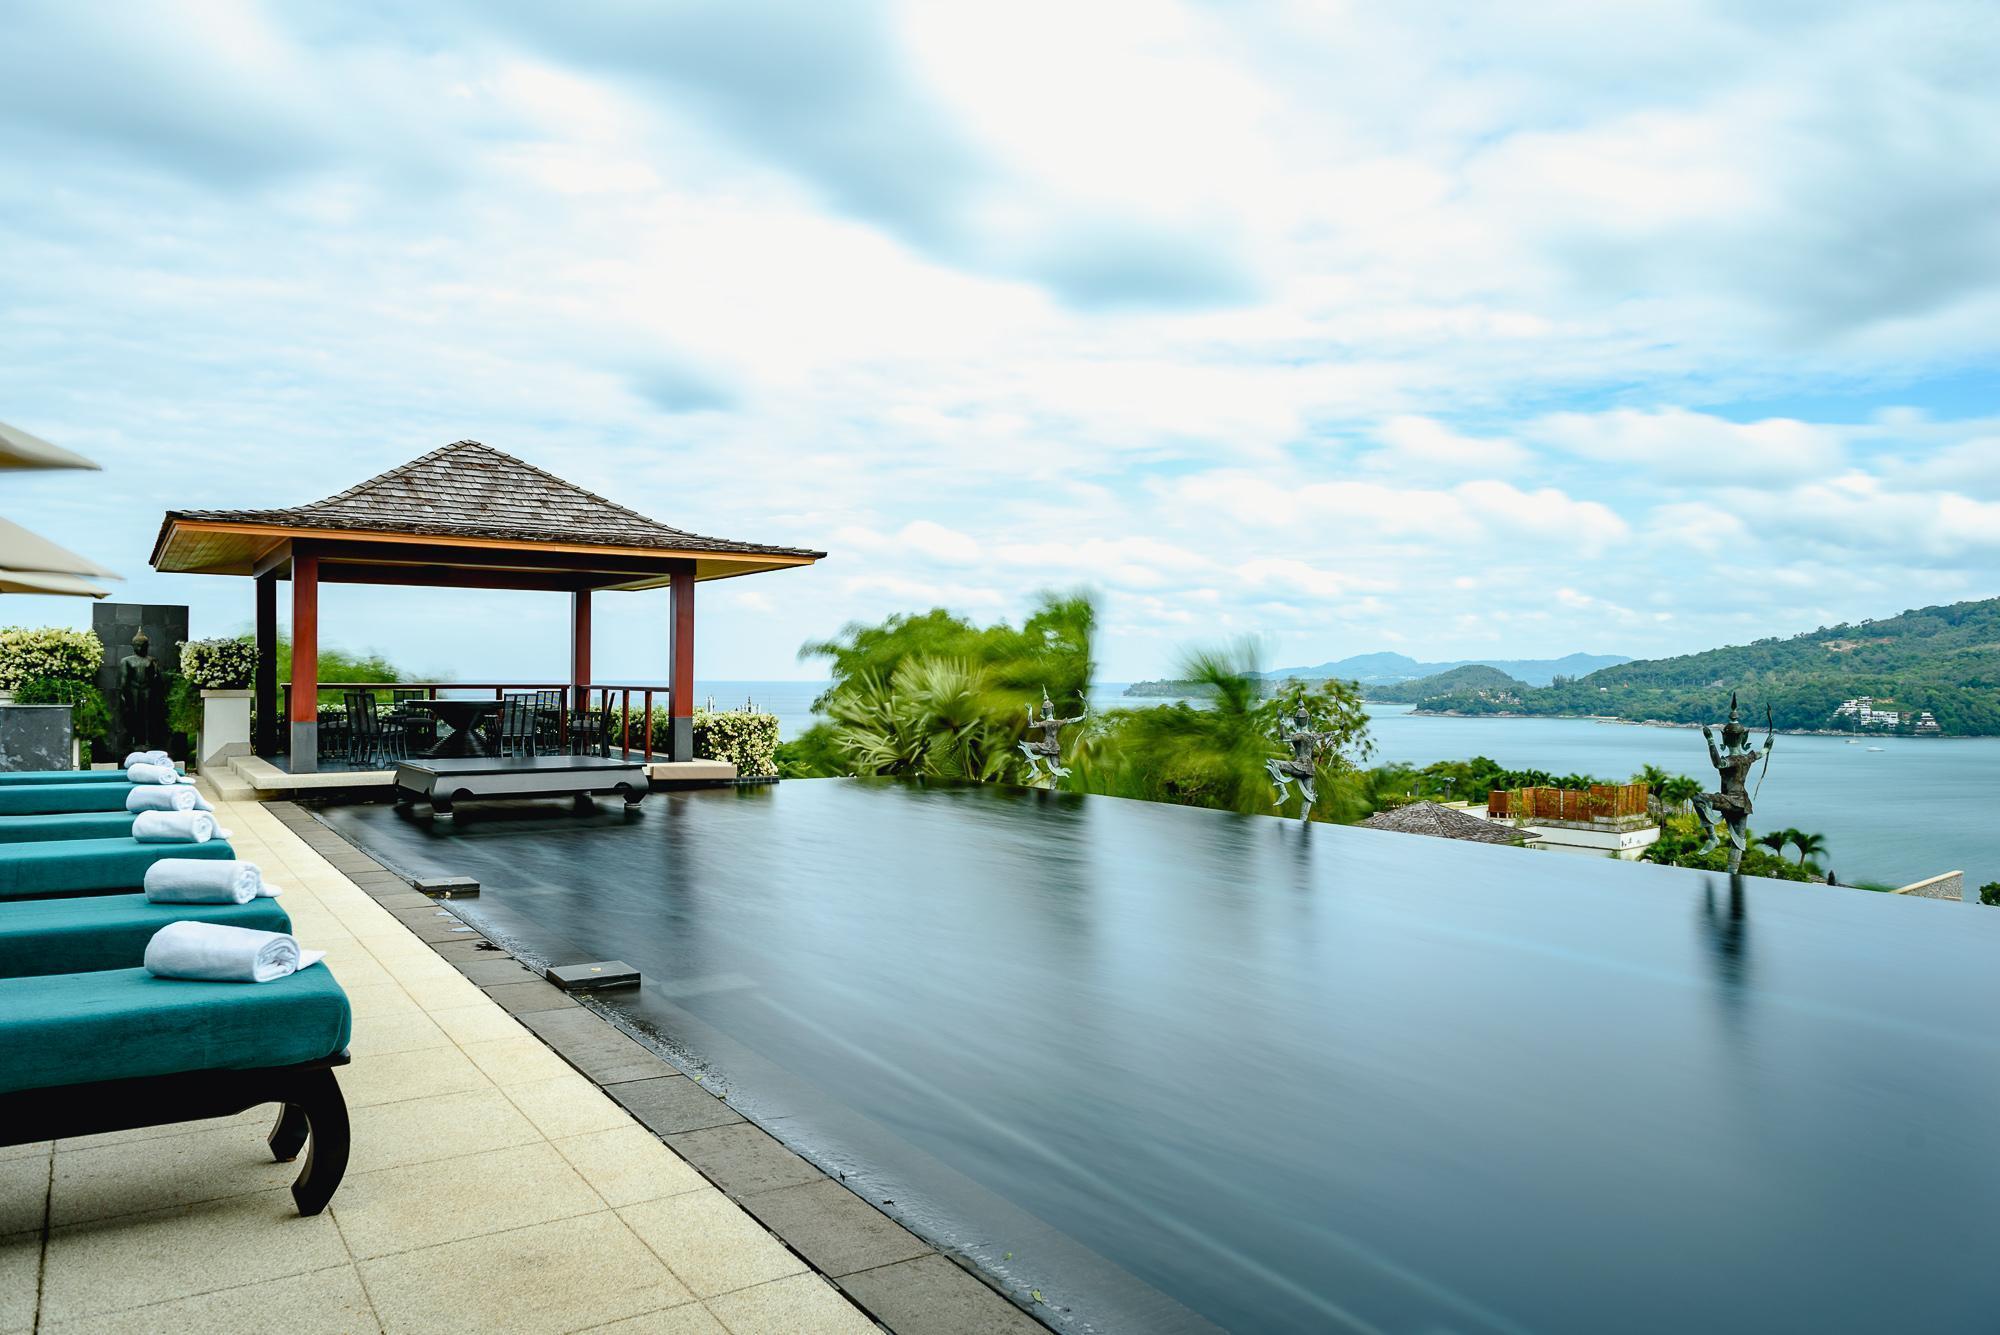 ⭐Star View Villa 6BR w/ Infinity Pool Near Beach วิลลา 6 ห้องนอน 6 ห้องน้ำส่วนตัว ขนาด 1160 ตร.ม. – กมลา